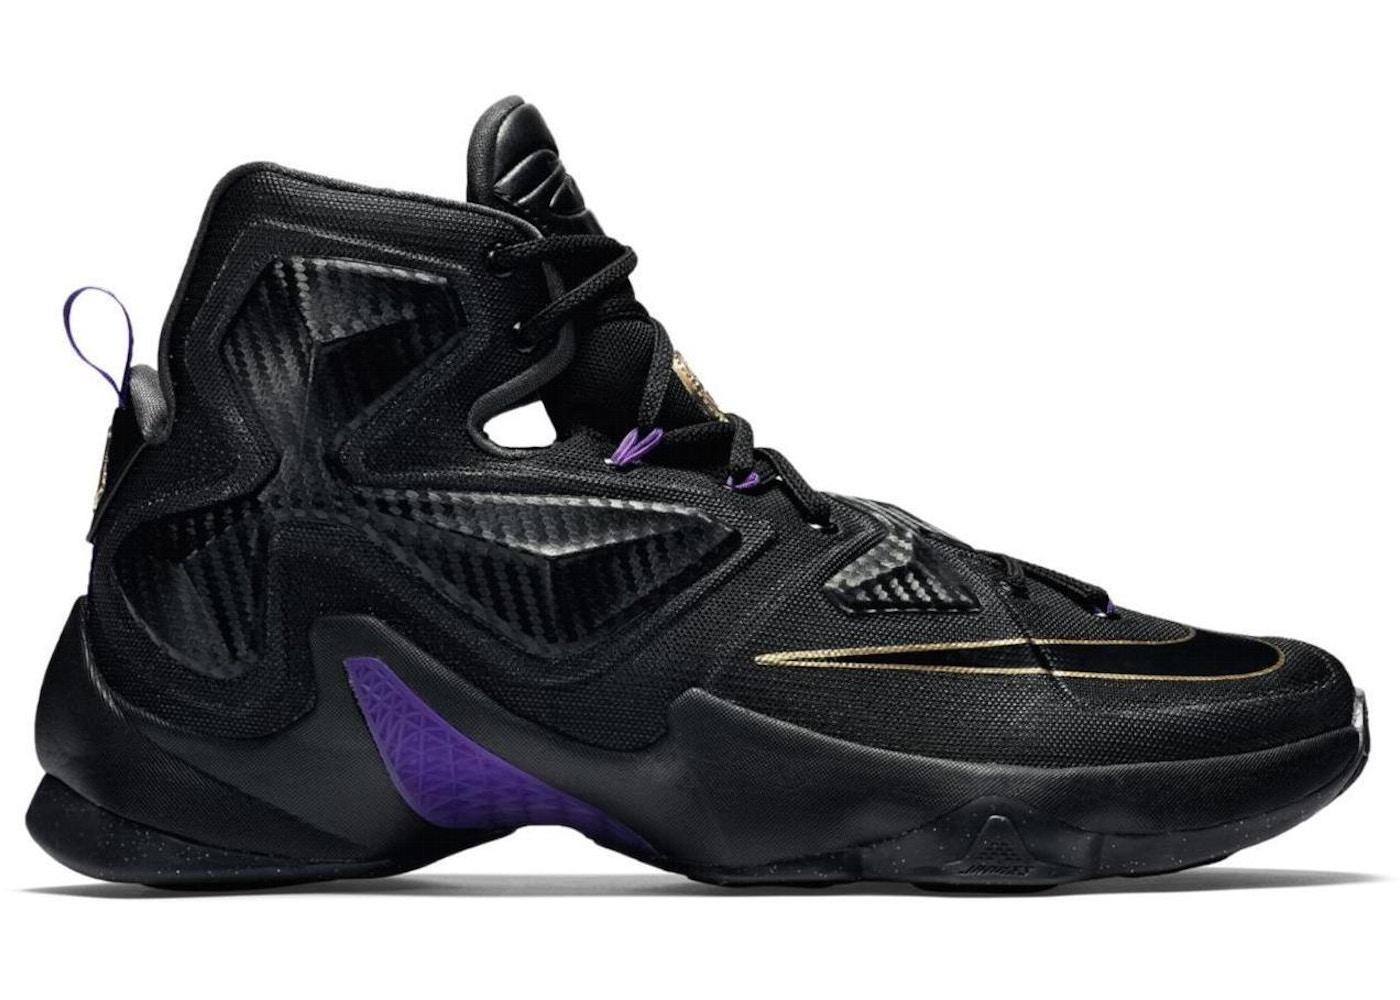 ed1d784f48bb9 Buy Nike LeBron 13 Shoes   Deadstock Sneakers